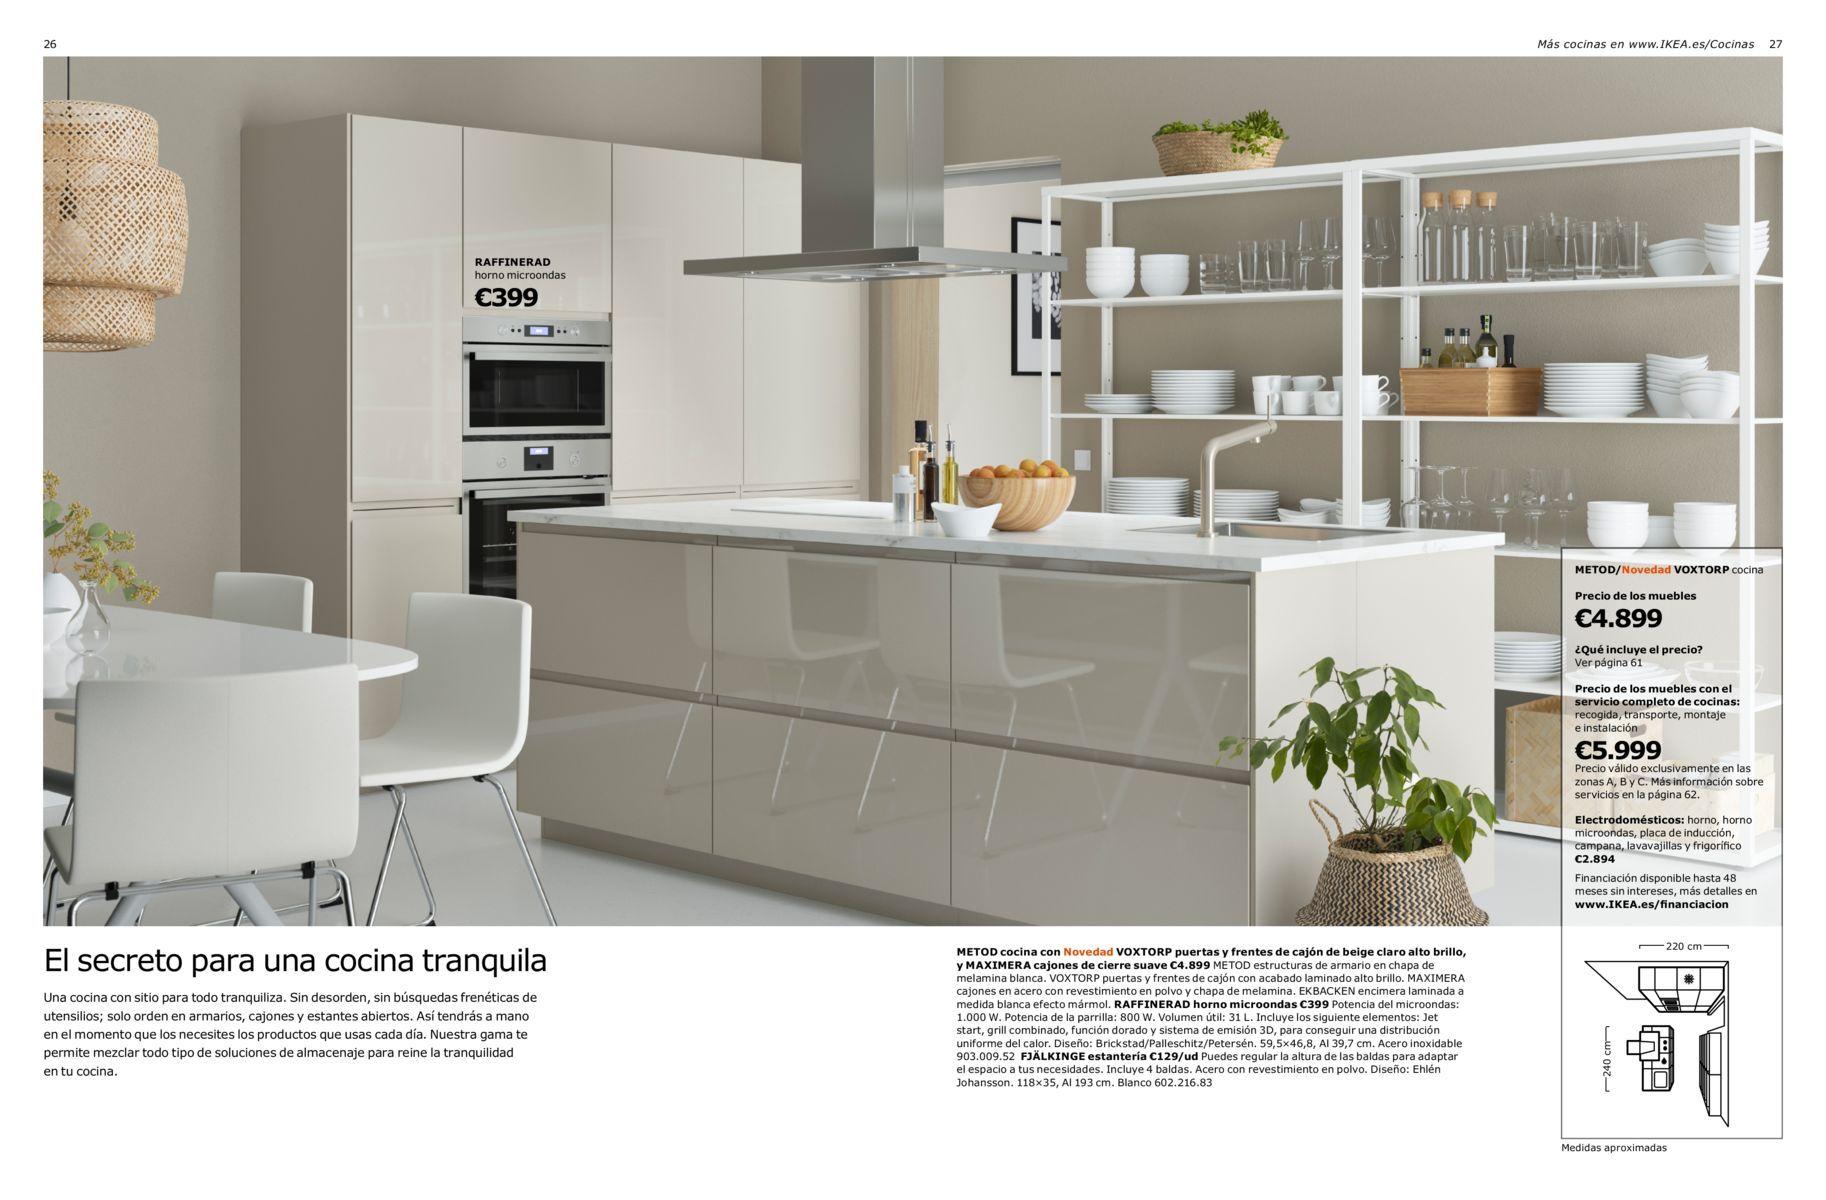 77 Grifos Para Cocinas Modernas Precios 2019 Muebles De Cocina Ikea Muebles De Cocina Cocina Ikea